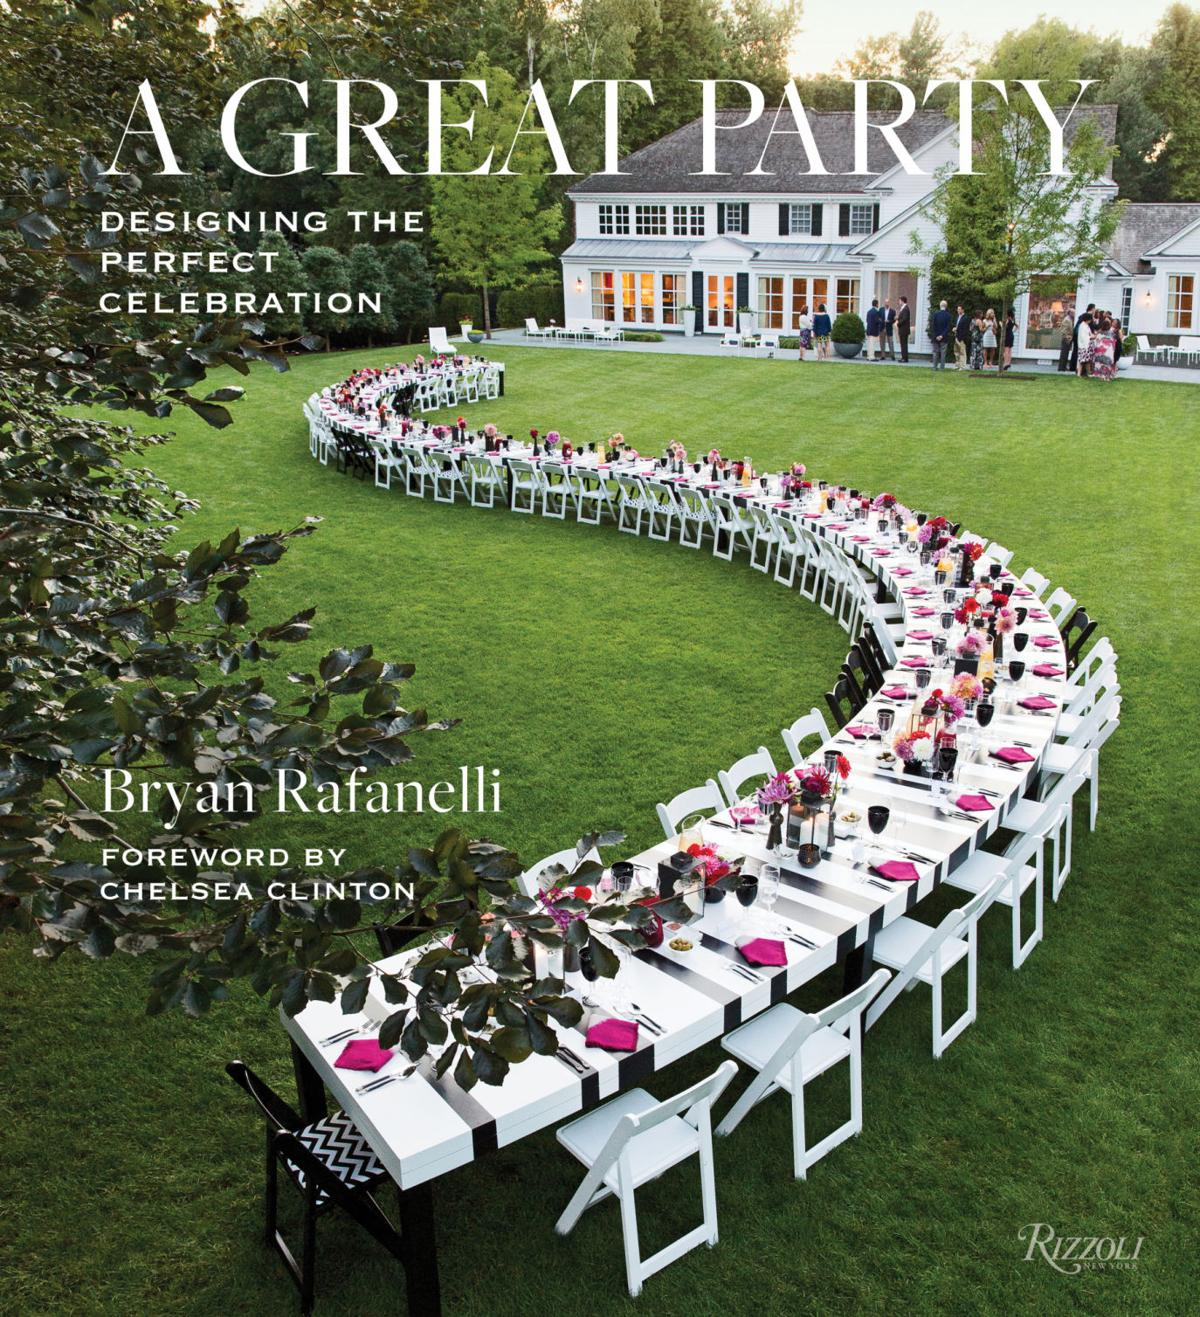 Celebrity party planner Bryan Rafanelli shares his secrets